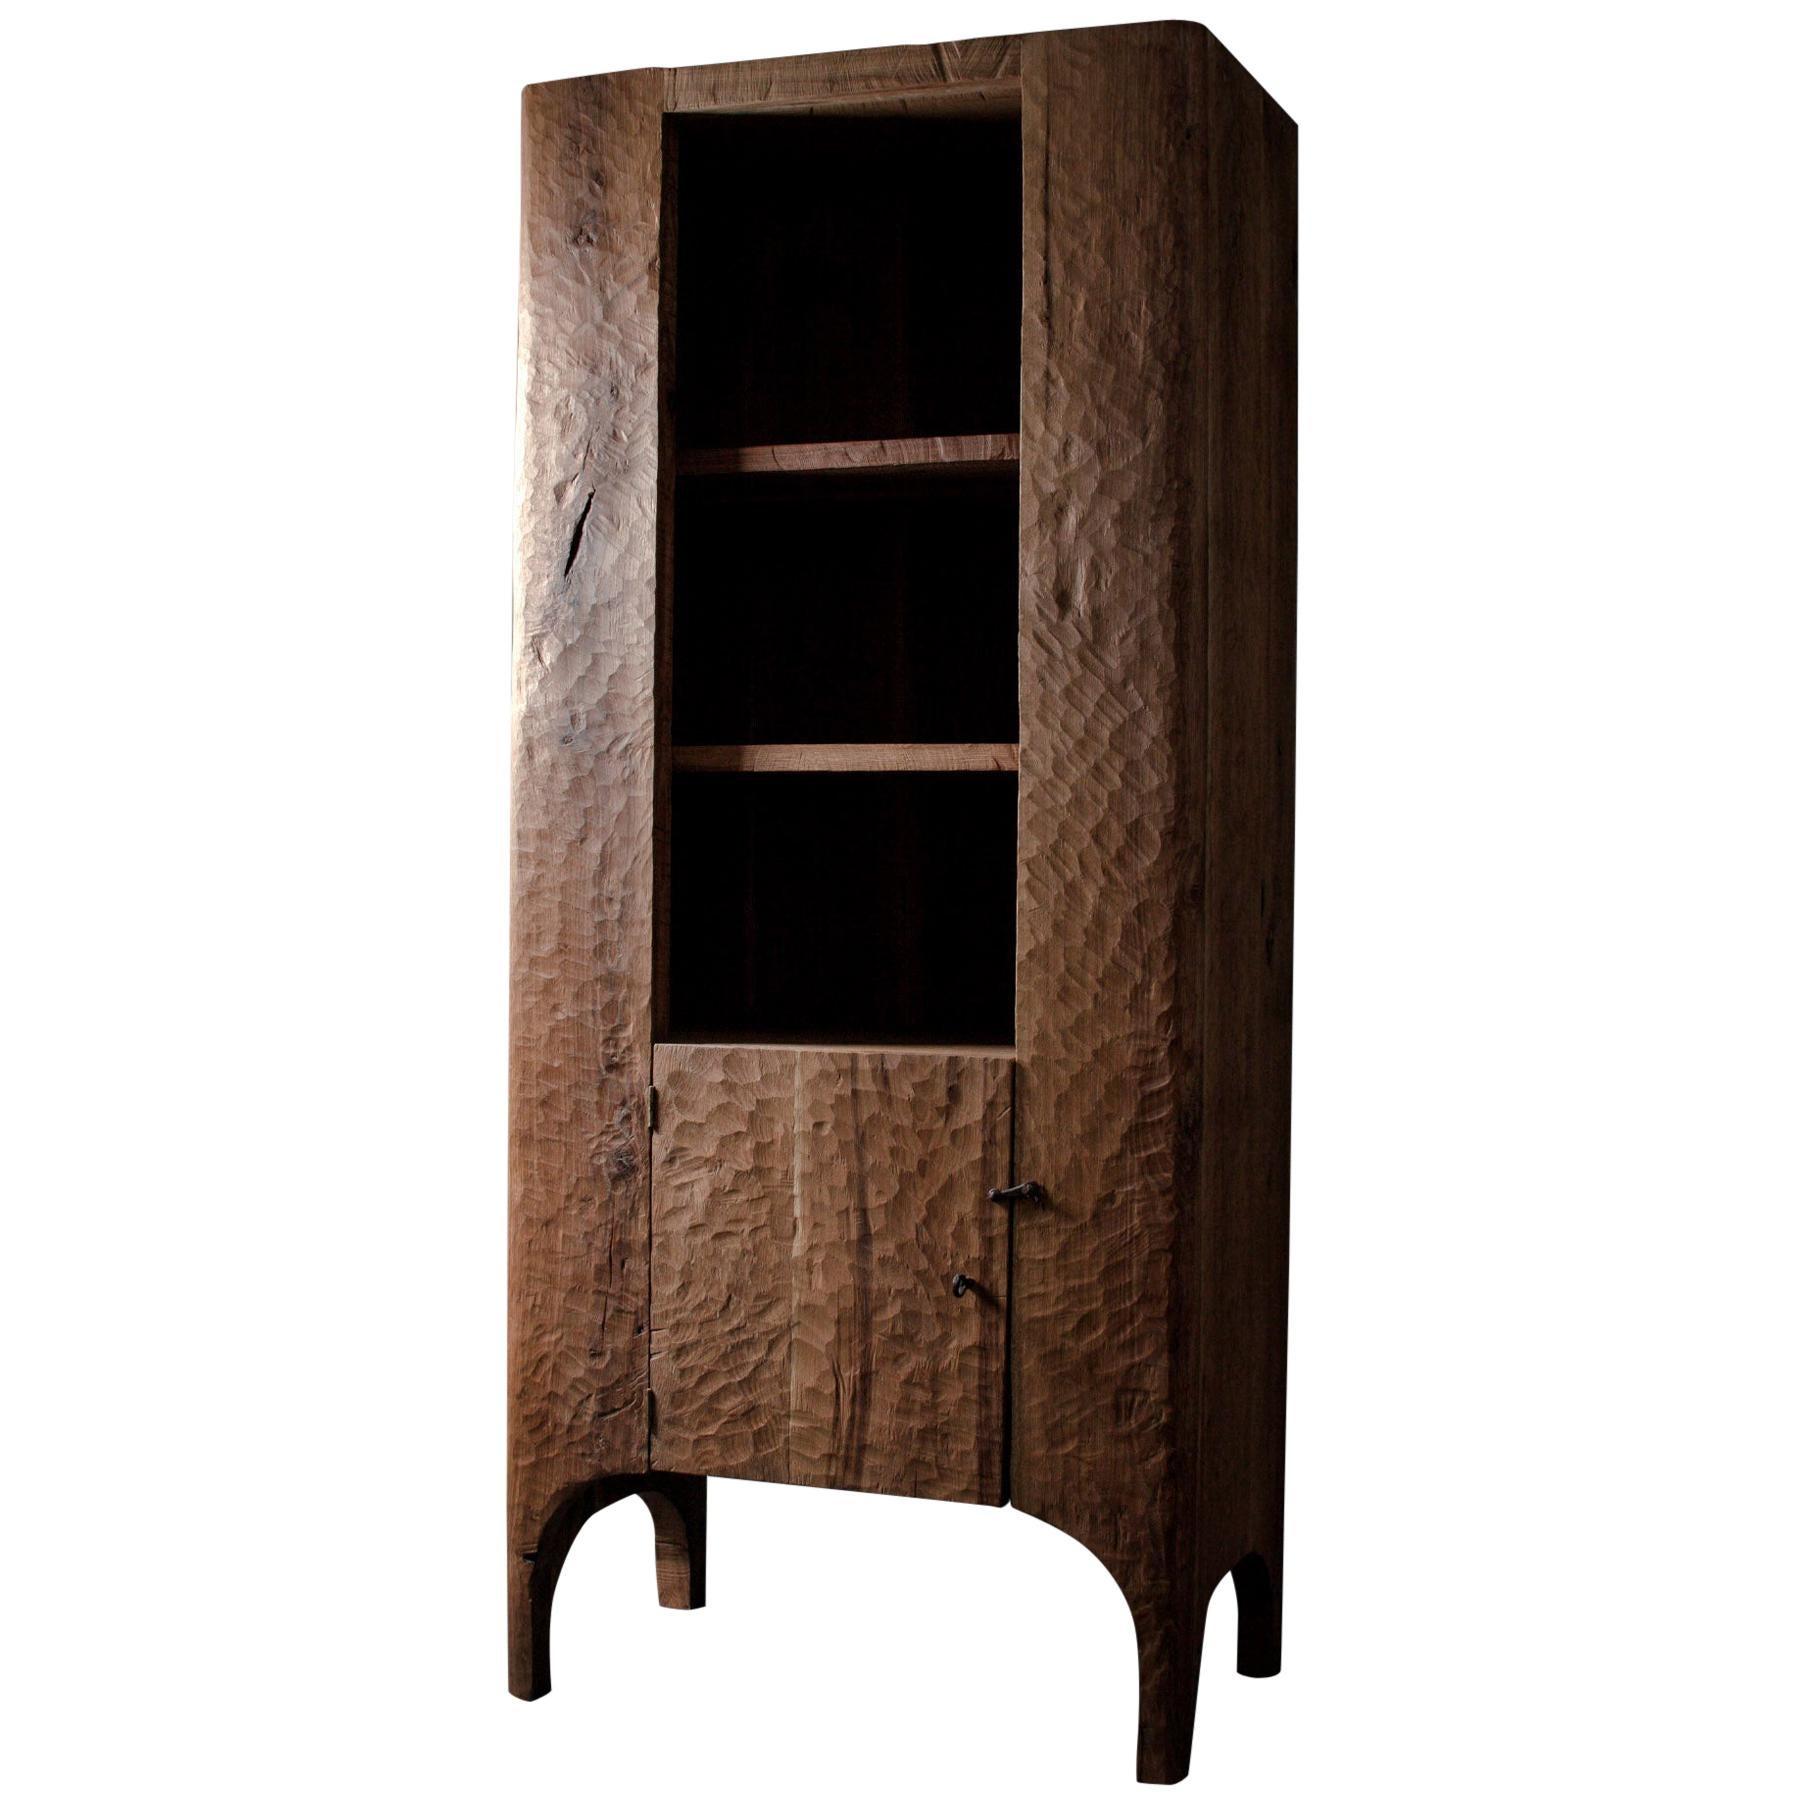 Contemporary Sculpted Cupboard/Bookcase in Solid Oak